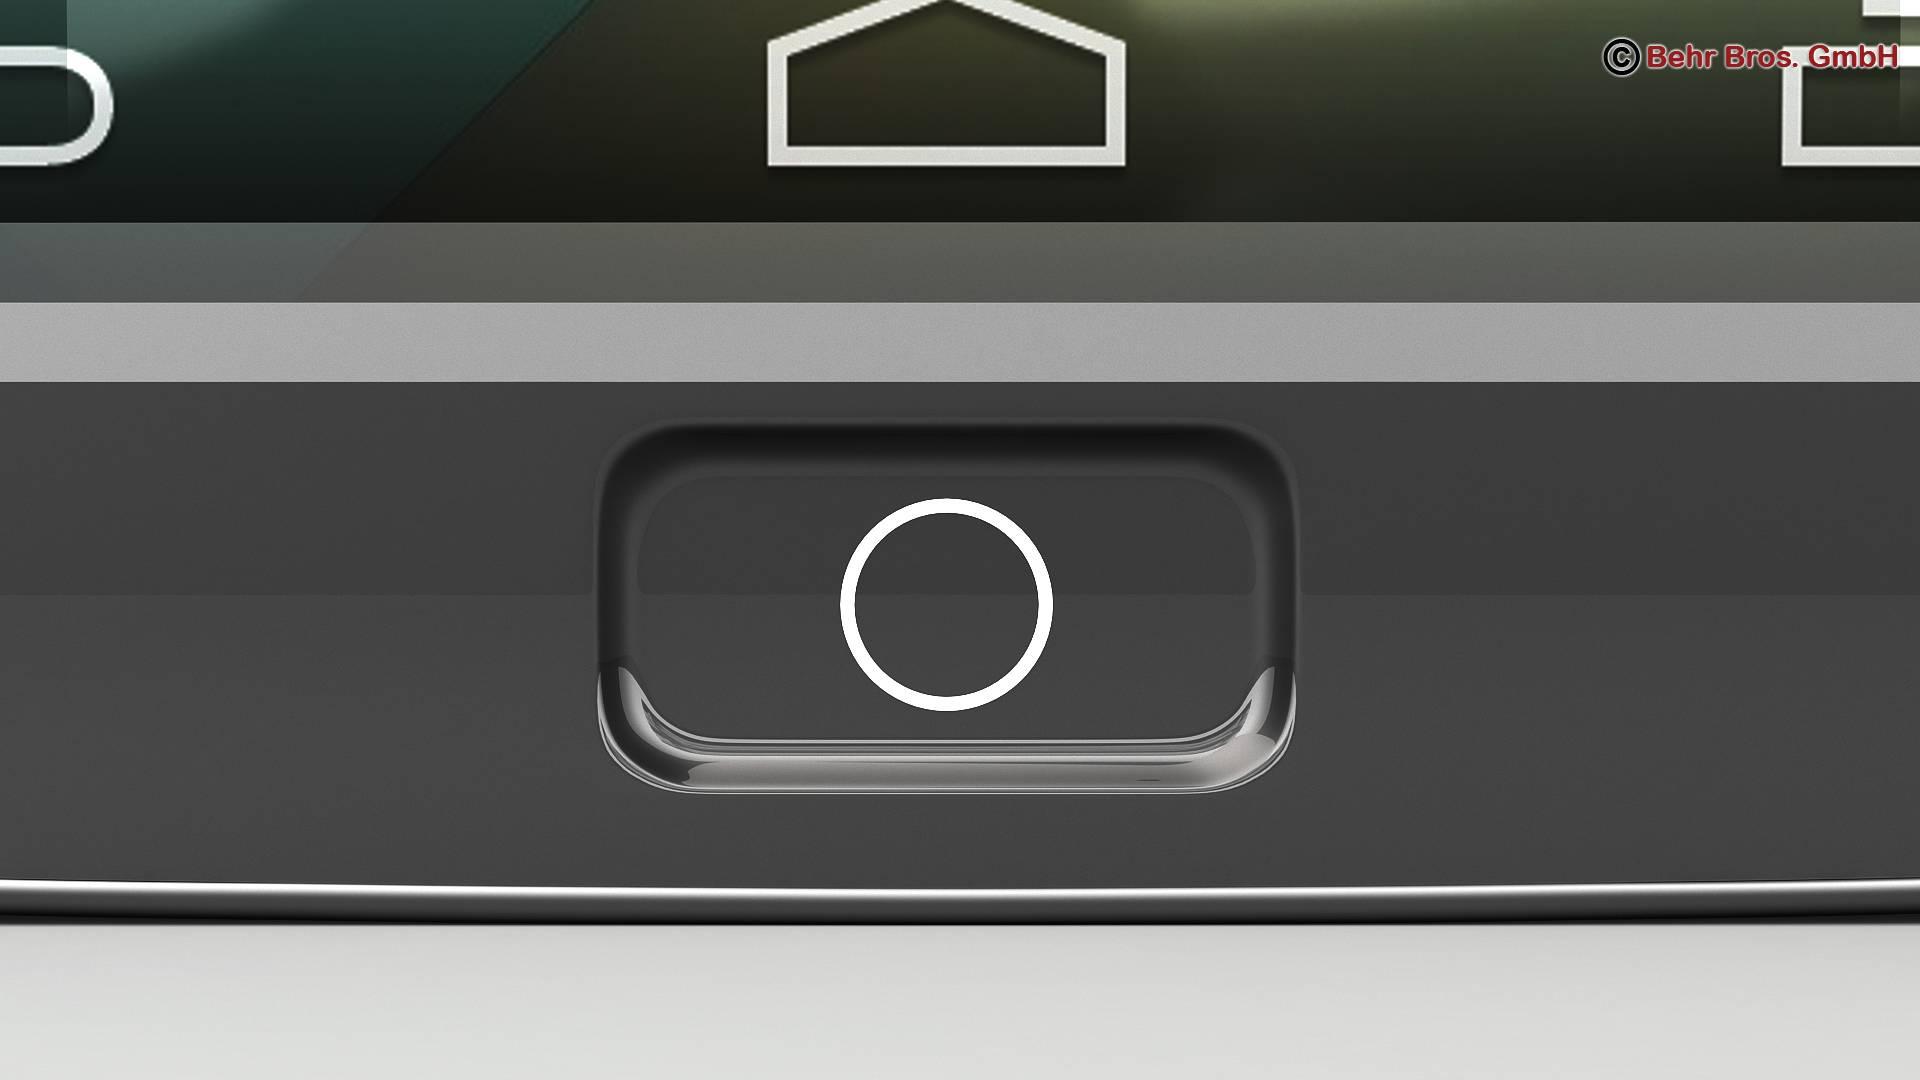 generic smartphone 6 inch 3d model 3ds max fbx c4d lwo ma mb obj 161668